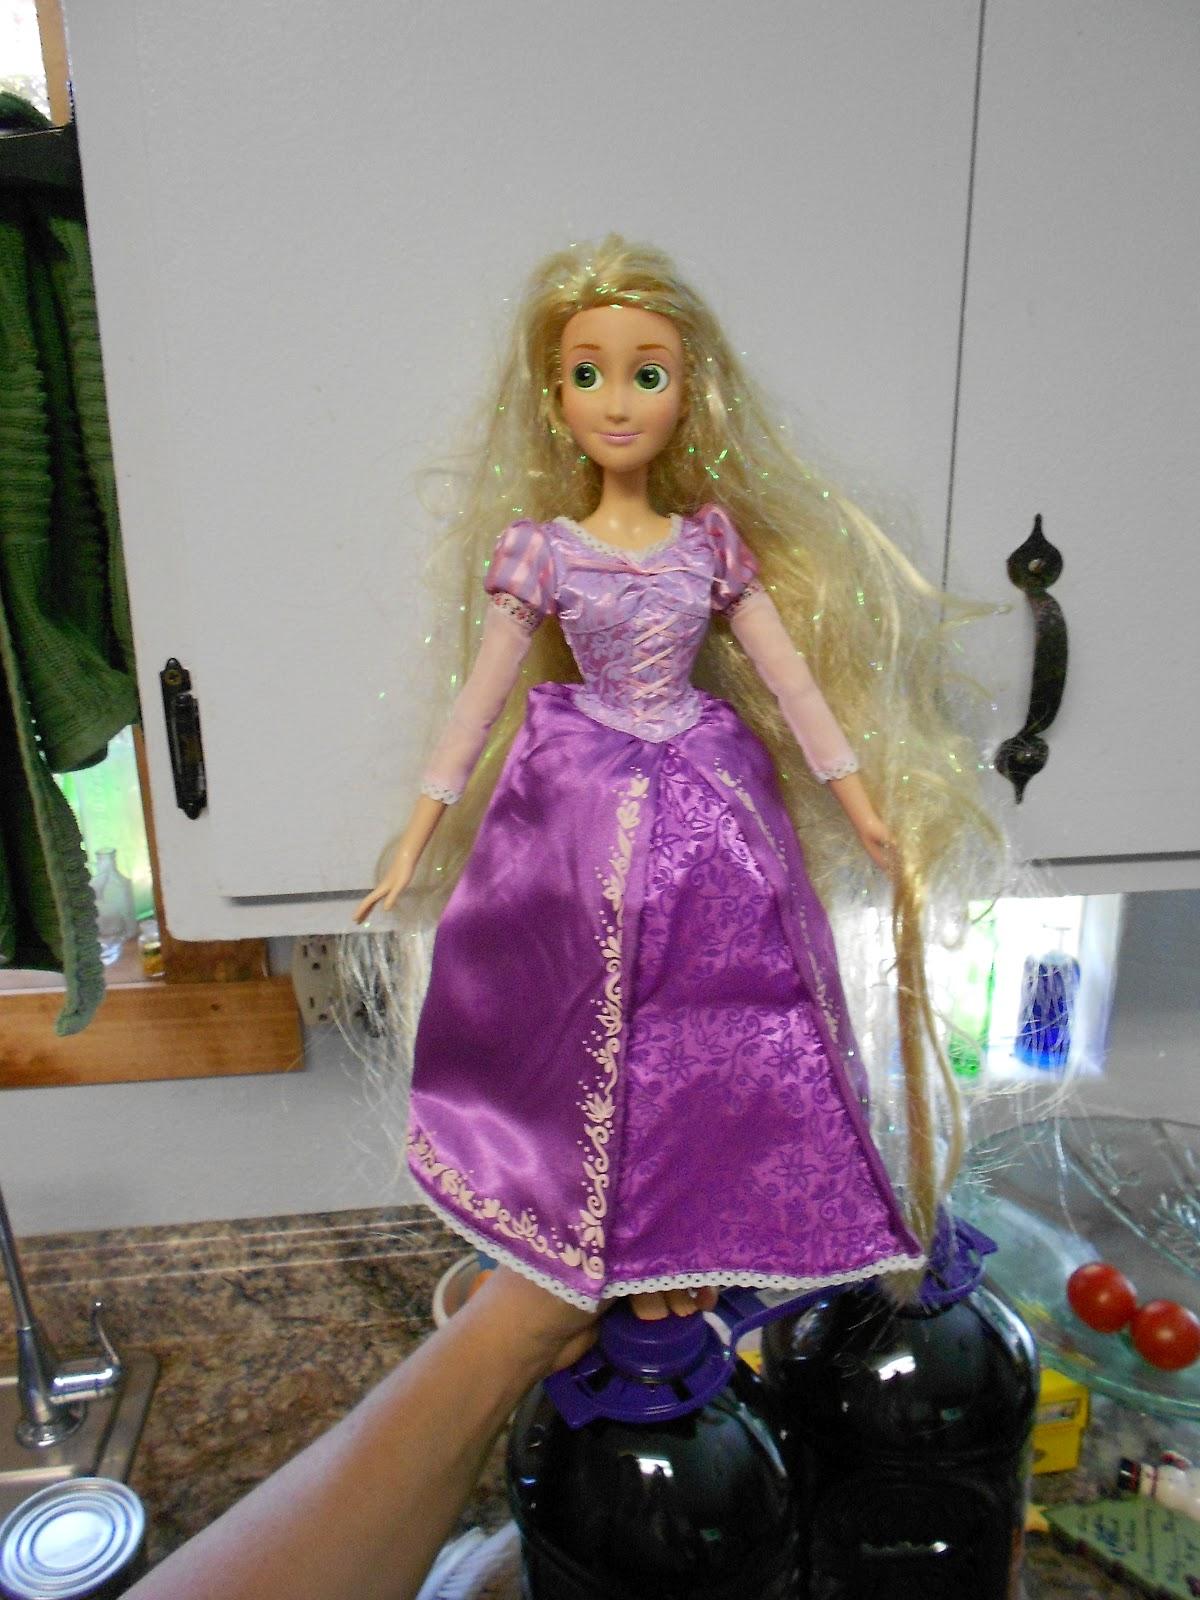 Dresses skirts clothes women disney store - Disney Store Singing Rapunzel Doll